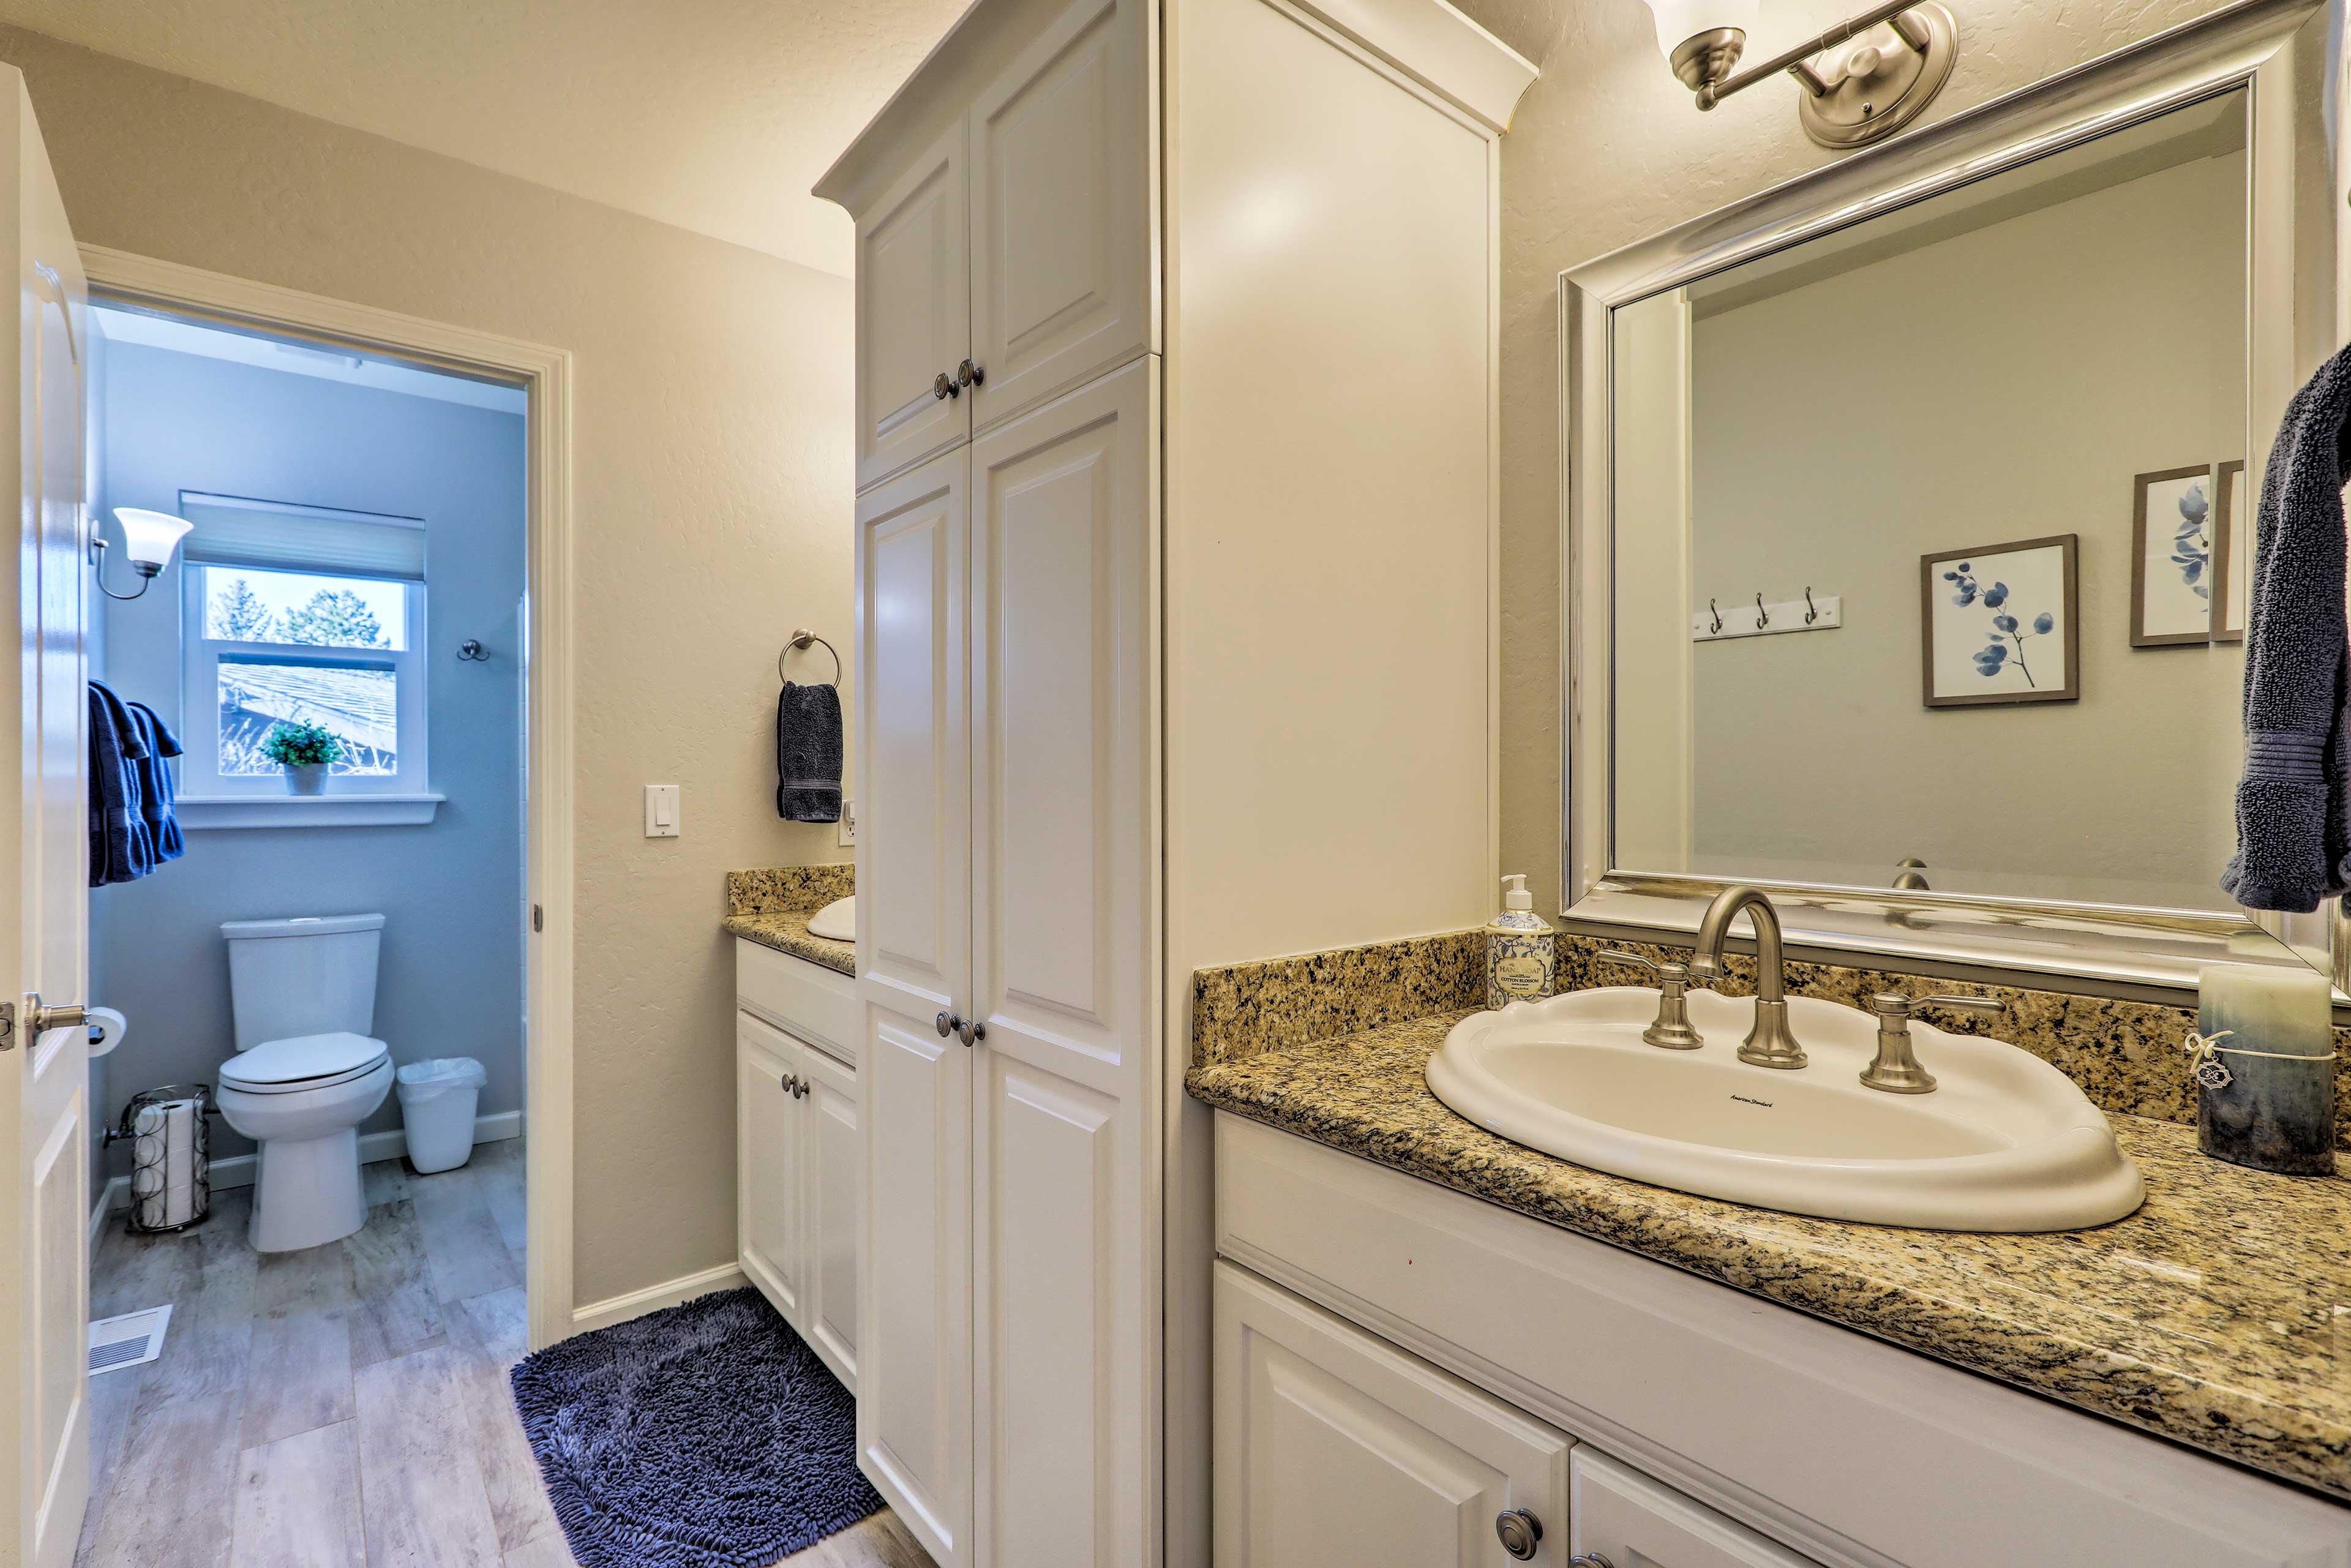 Dual sinks provide plenty of room to freshen up.